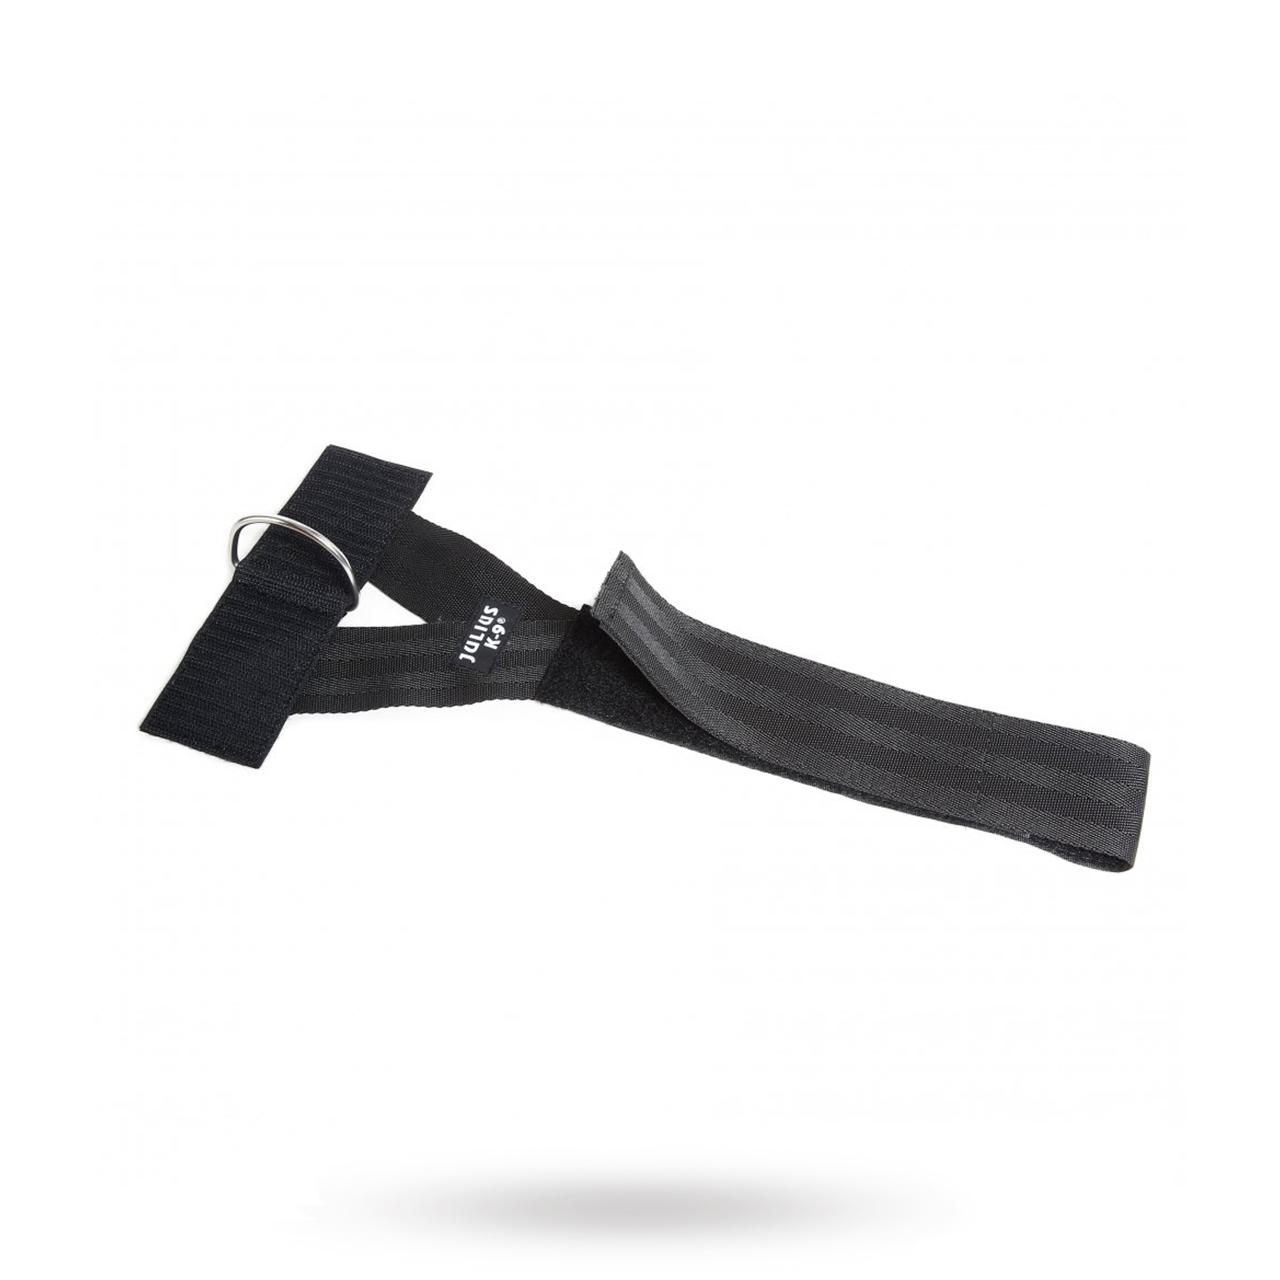 K9 IDC Front Control Y-Belt